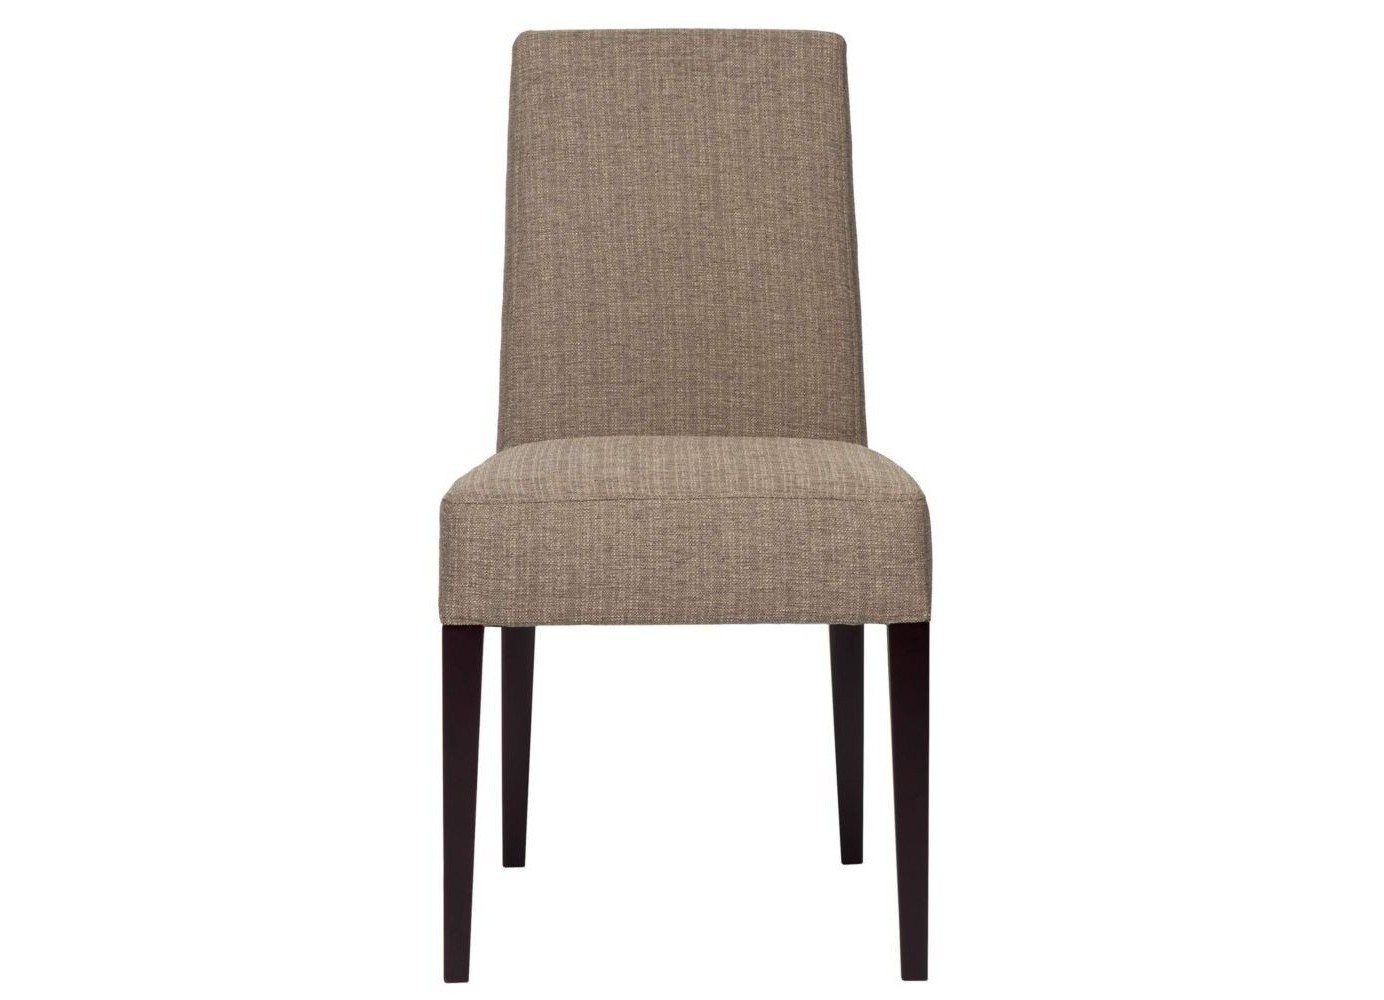 СтулОбеденные стулья<br><br><br>Material: Текстиль<br>Width см: 48<br>Depth см: 58<br>Height см: 90